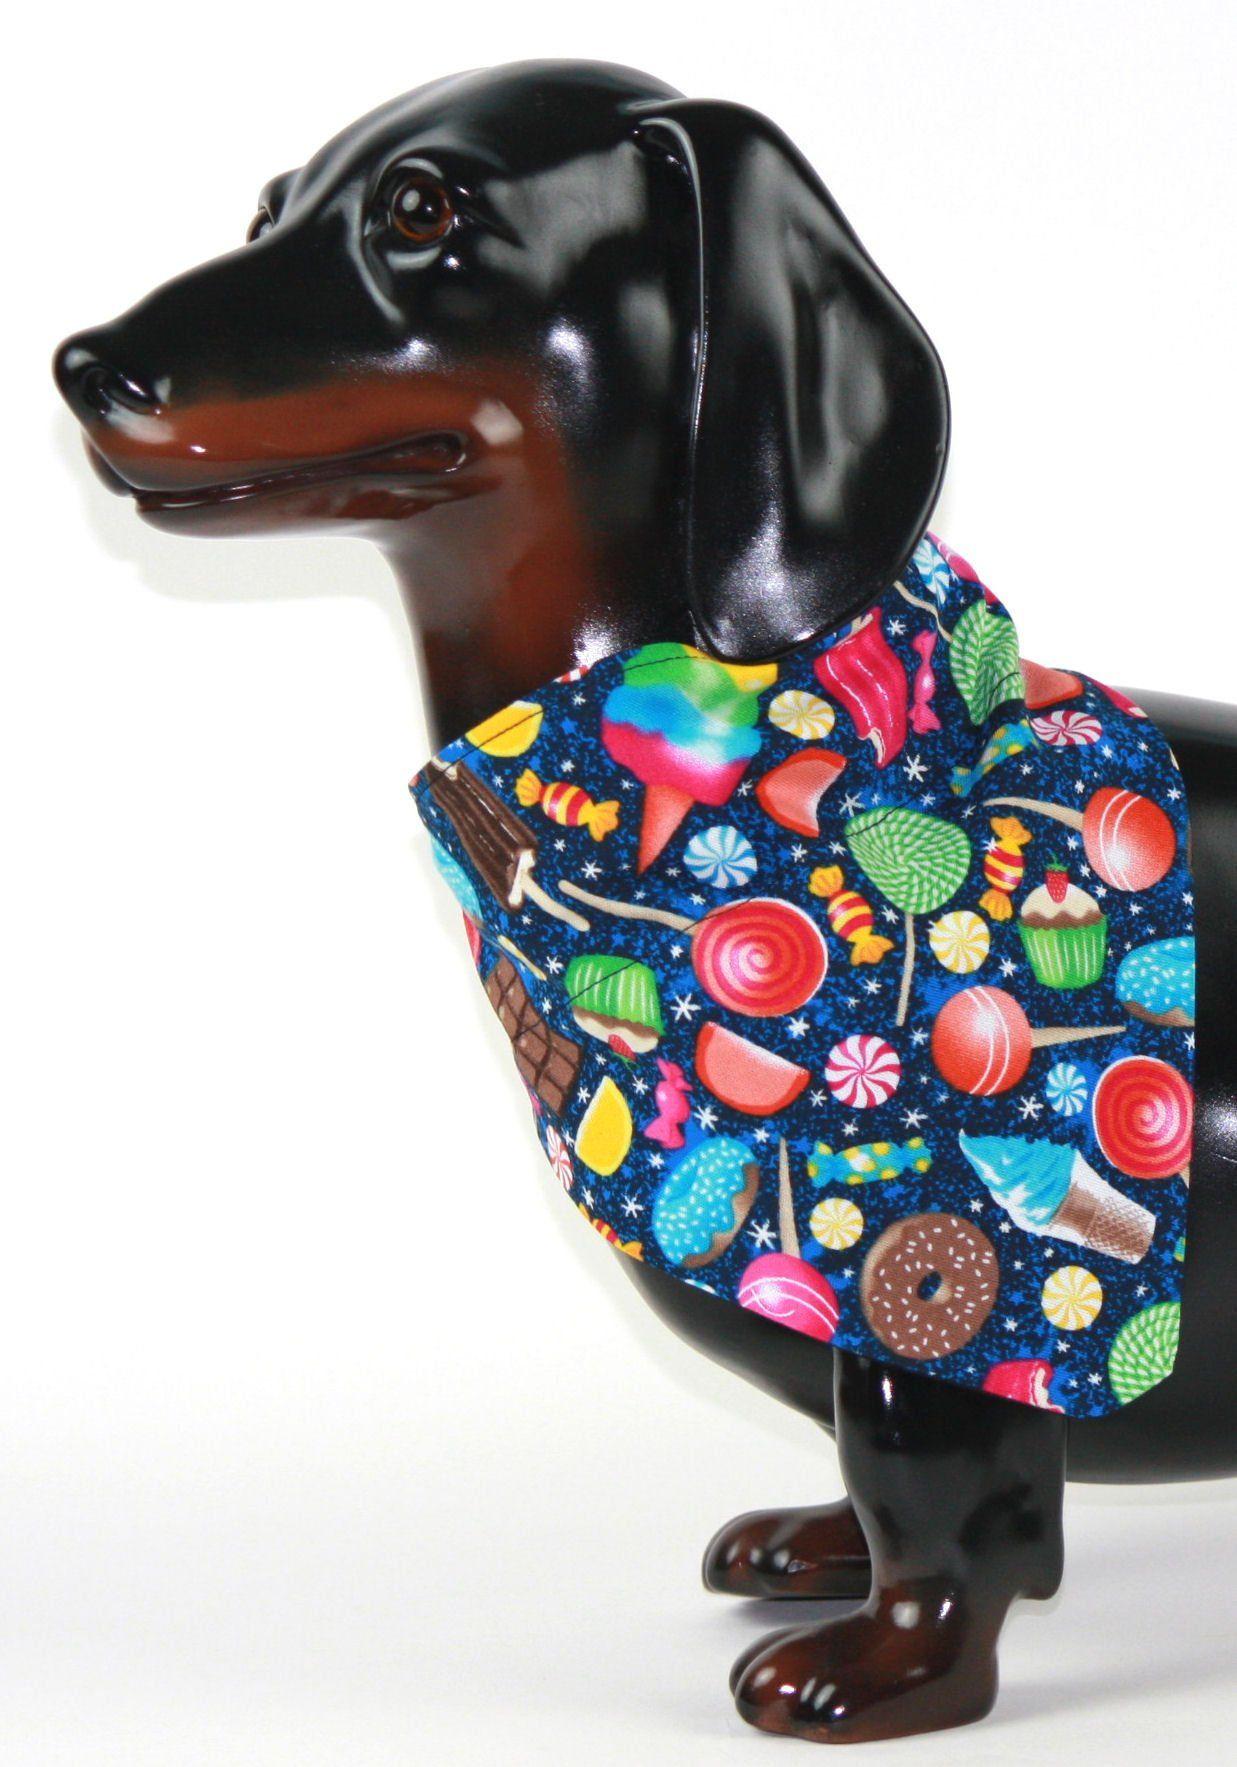 Candy Dog Collar Bandana Personalized Dog Bandana Dog Etsy Dog Bandana Dog Collar Bandana Best Dog Gifts